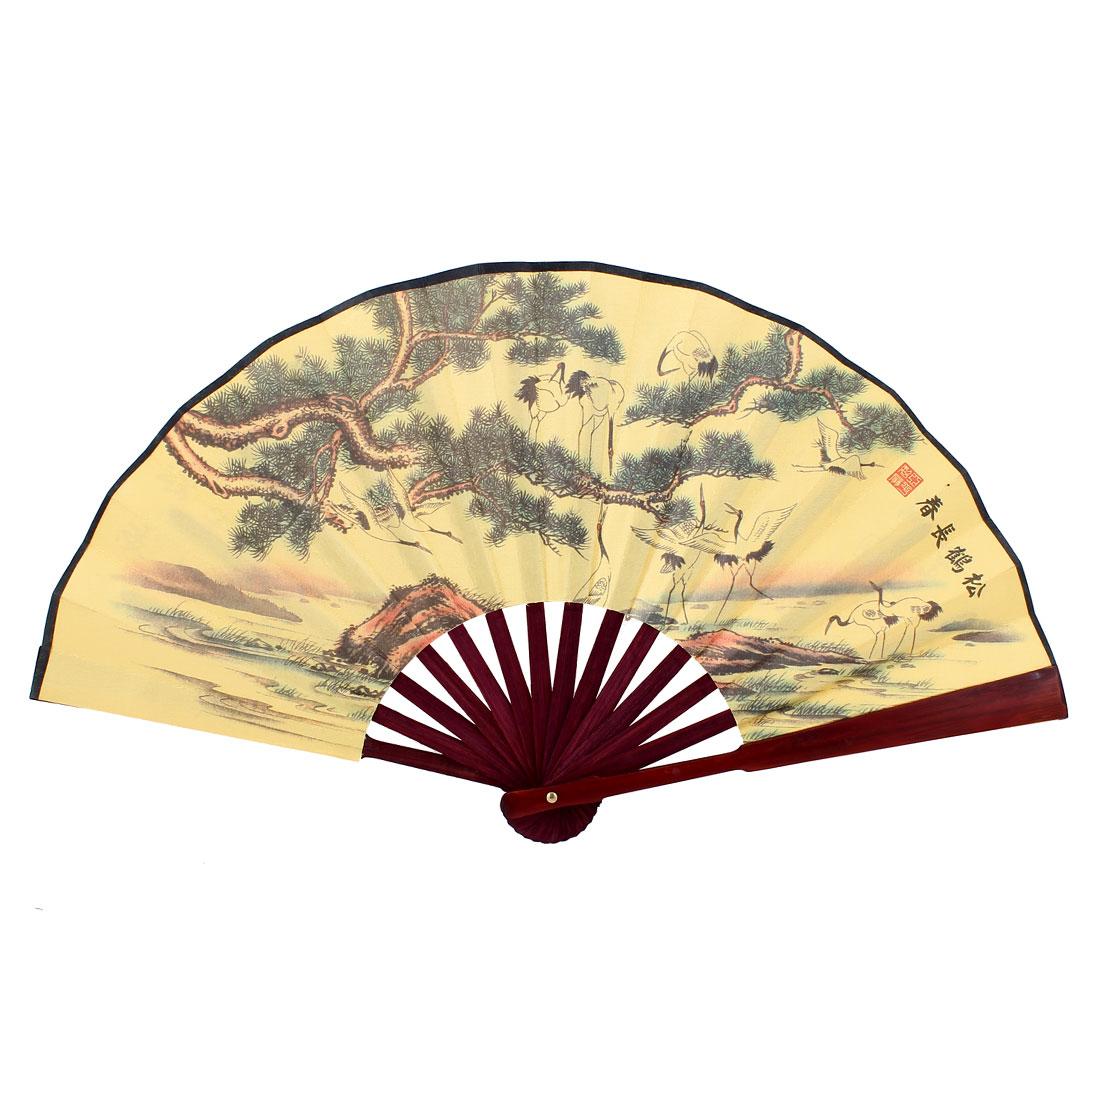 Bamboo Handle Chinese Poem Tree Crane Bird Print Folding Hand Fan 47cm Yellow